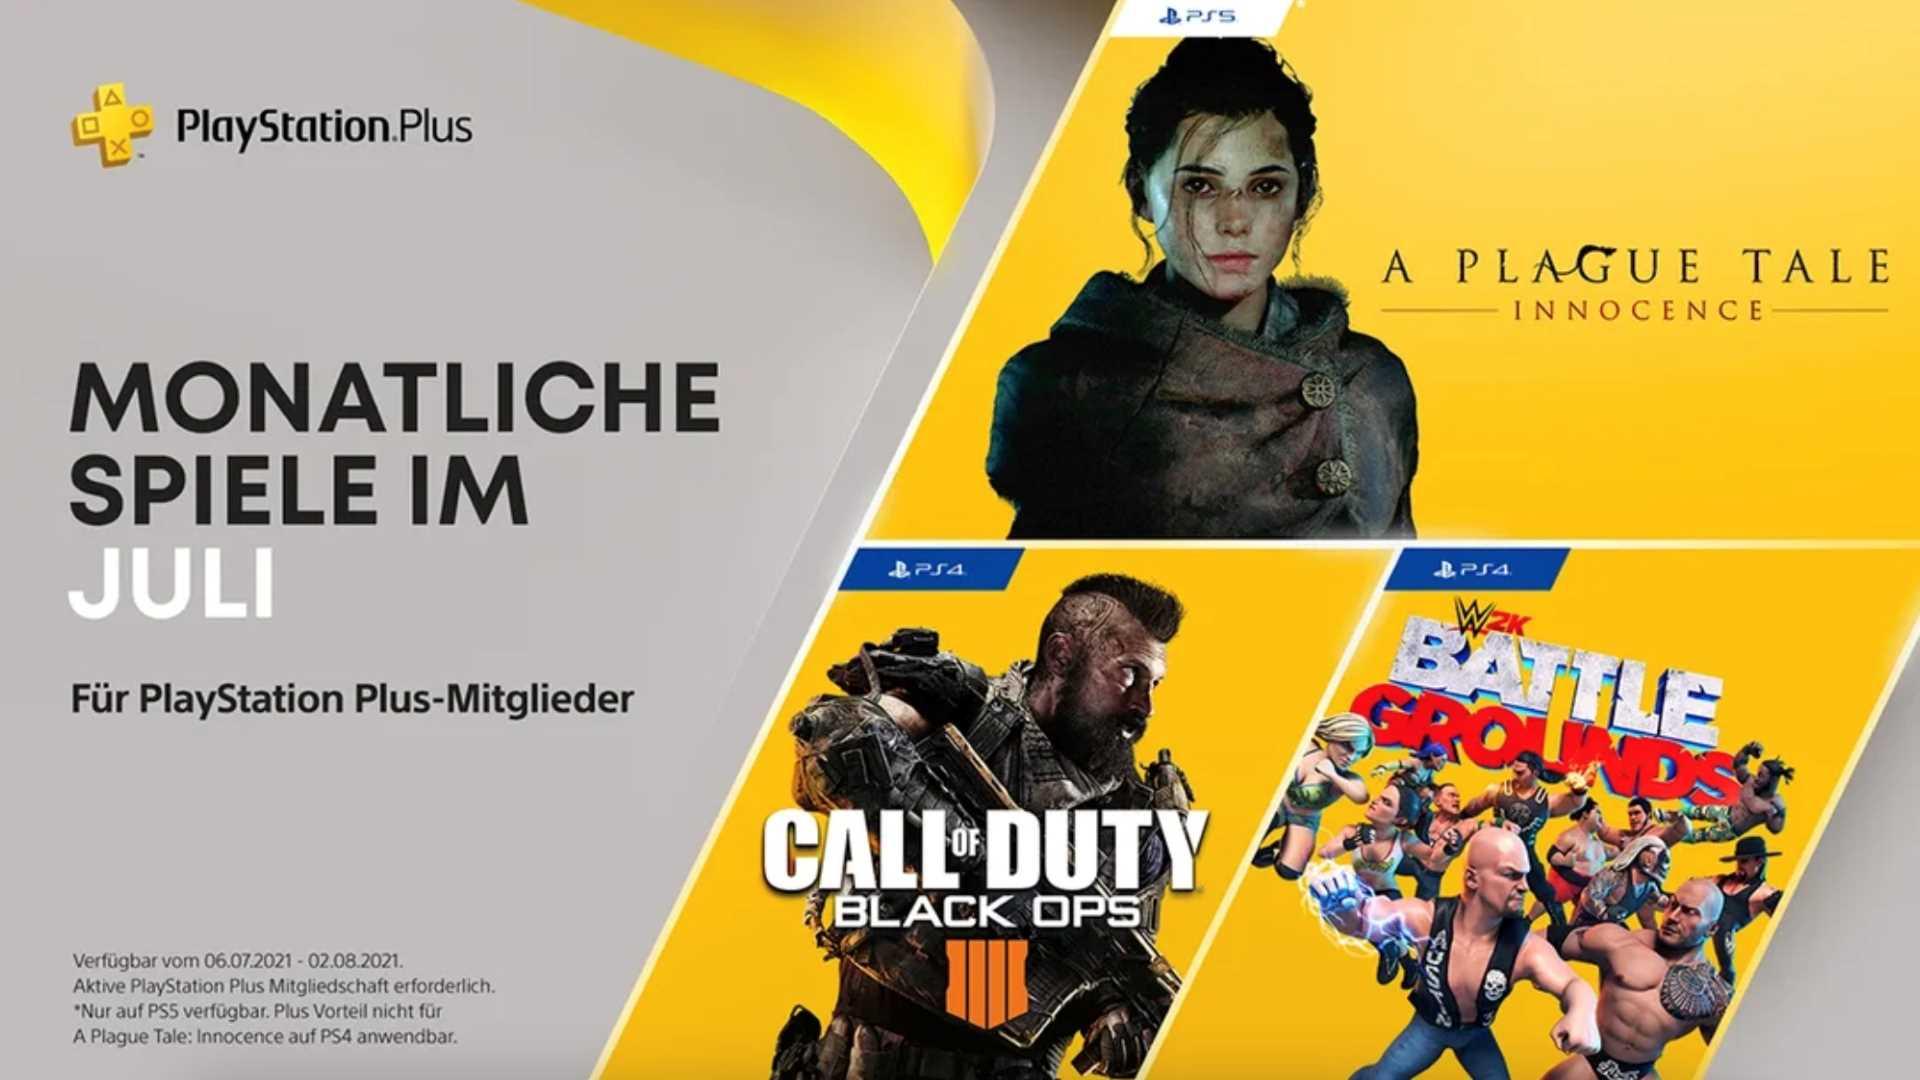 PlayStation Plus Juli 2021 - Key Art